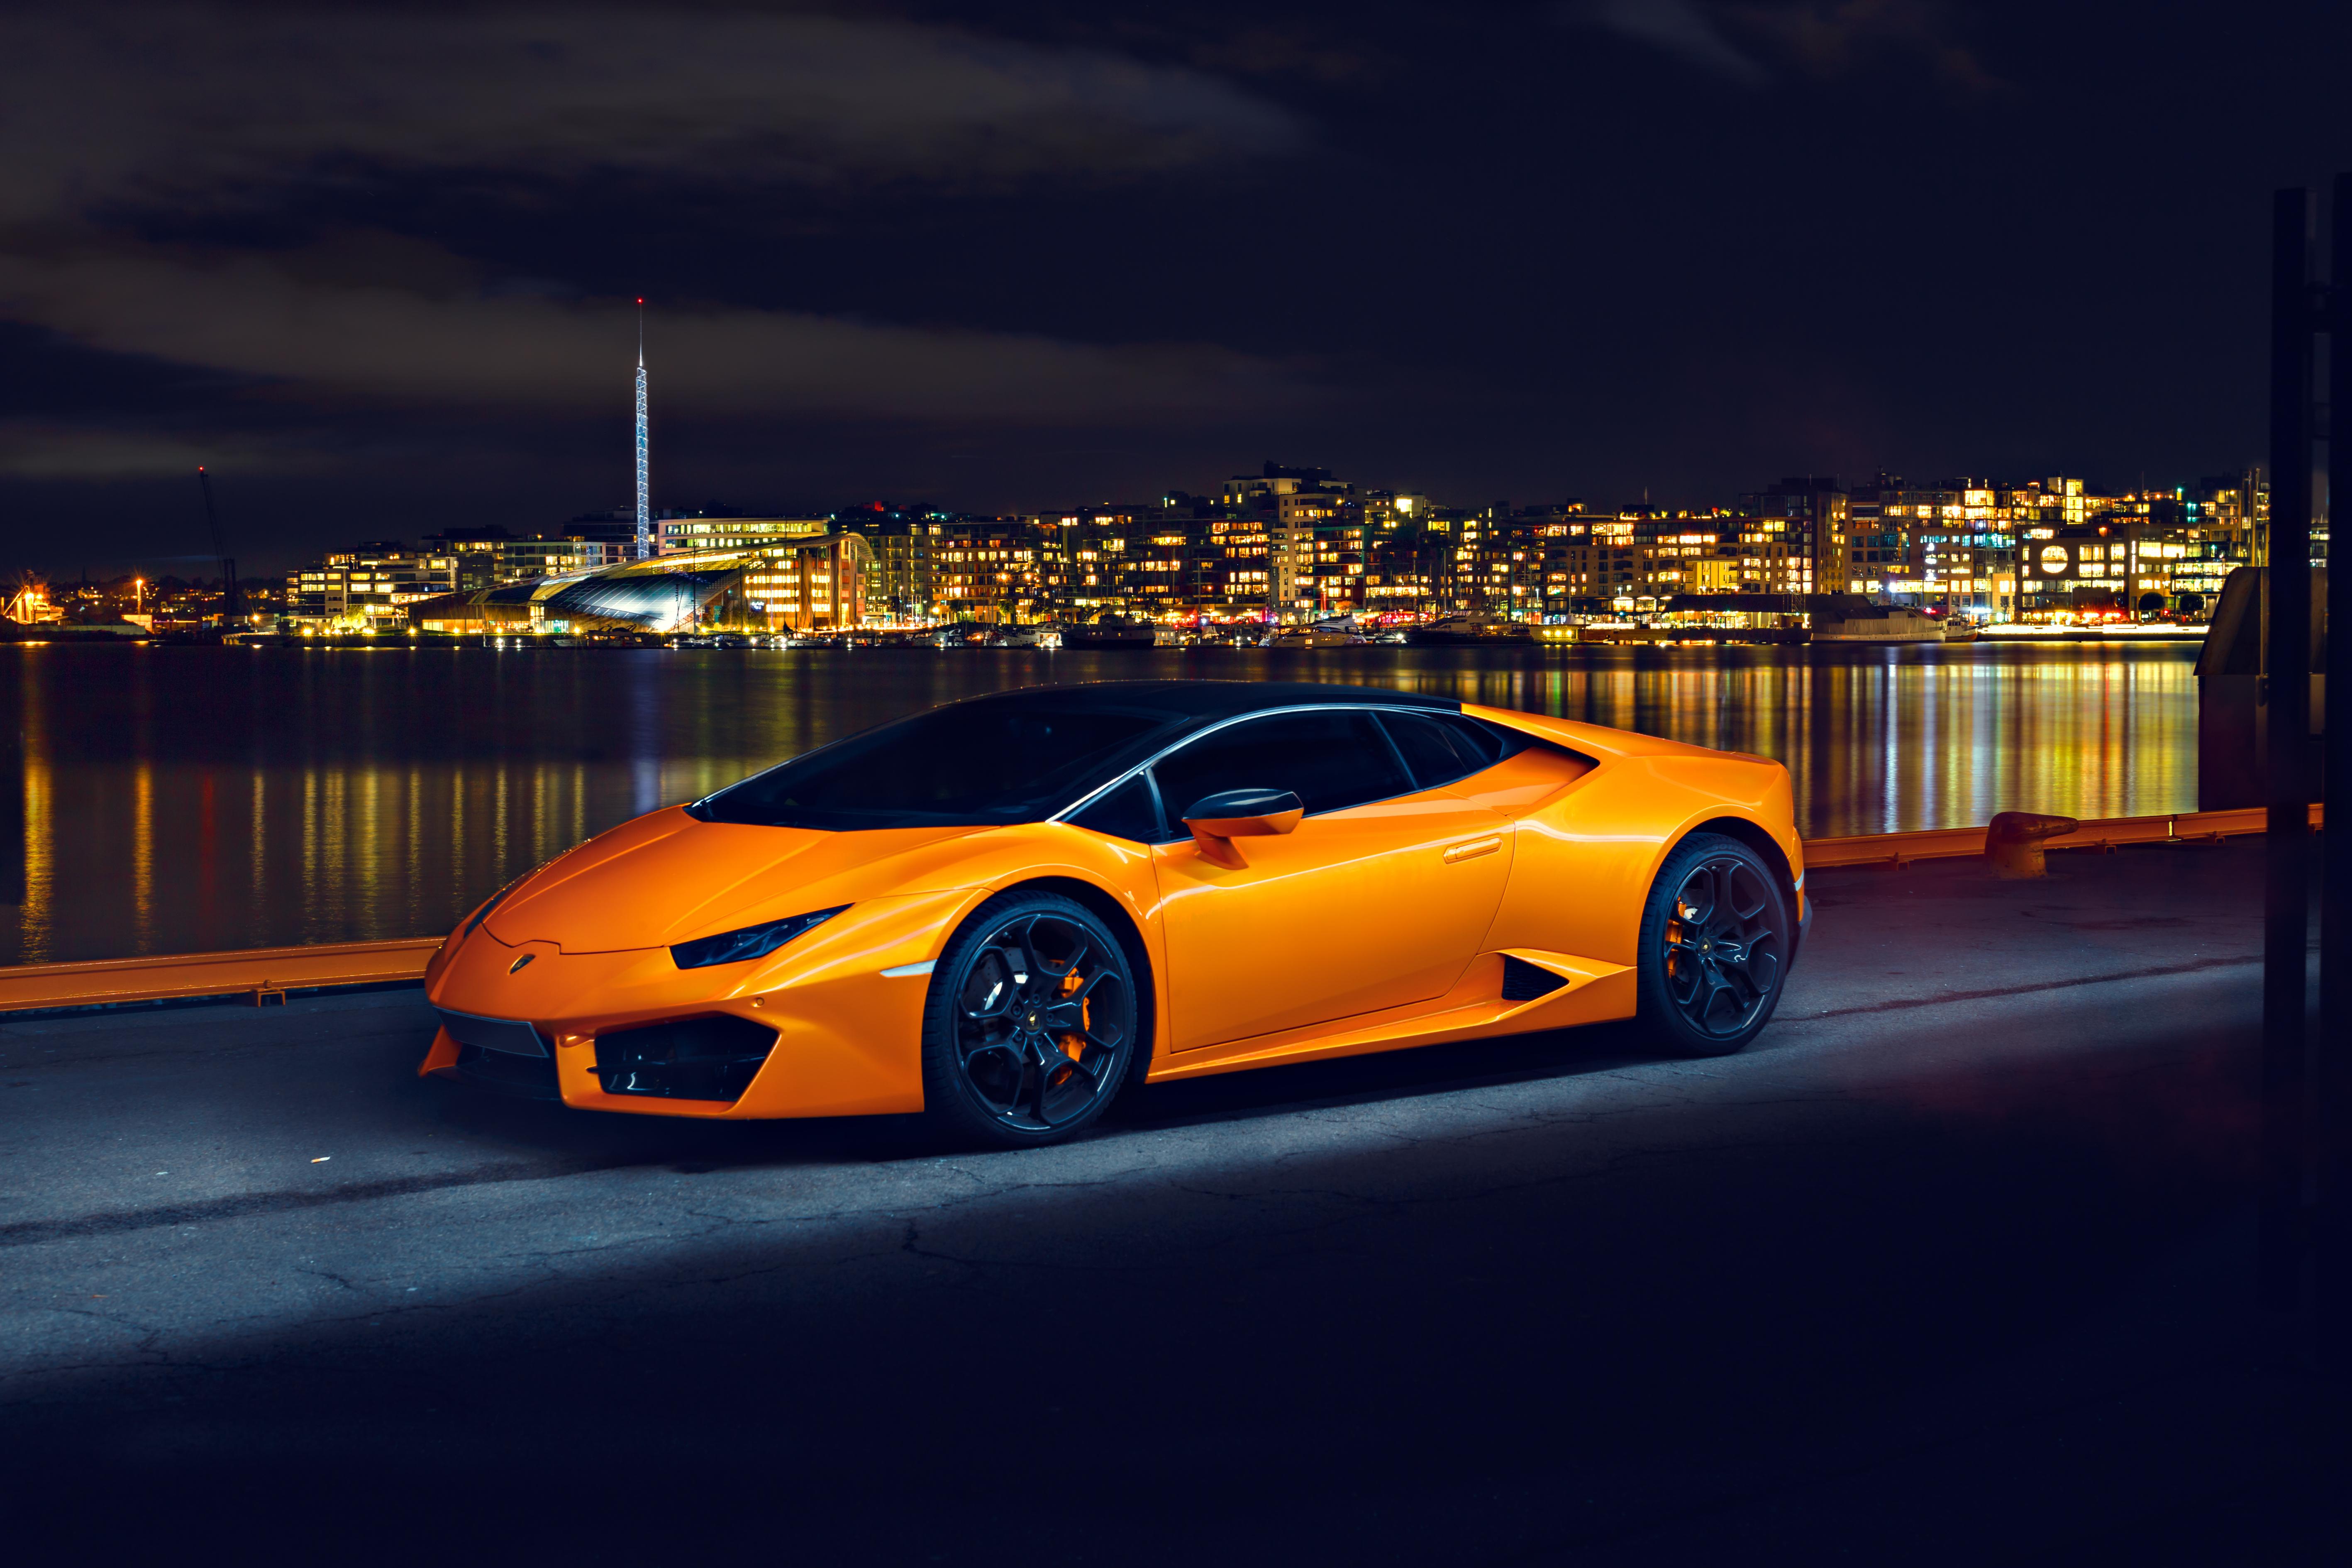 Lamborghini Huracan LP580 Night Photoshoot, HD Cars, 4k ...